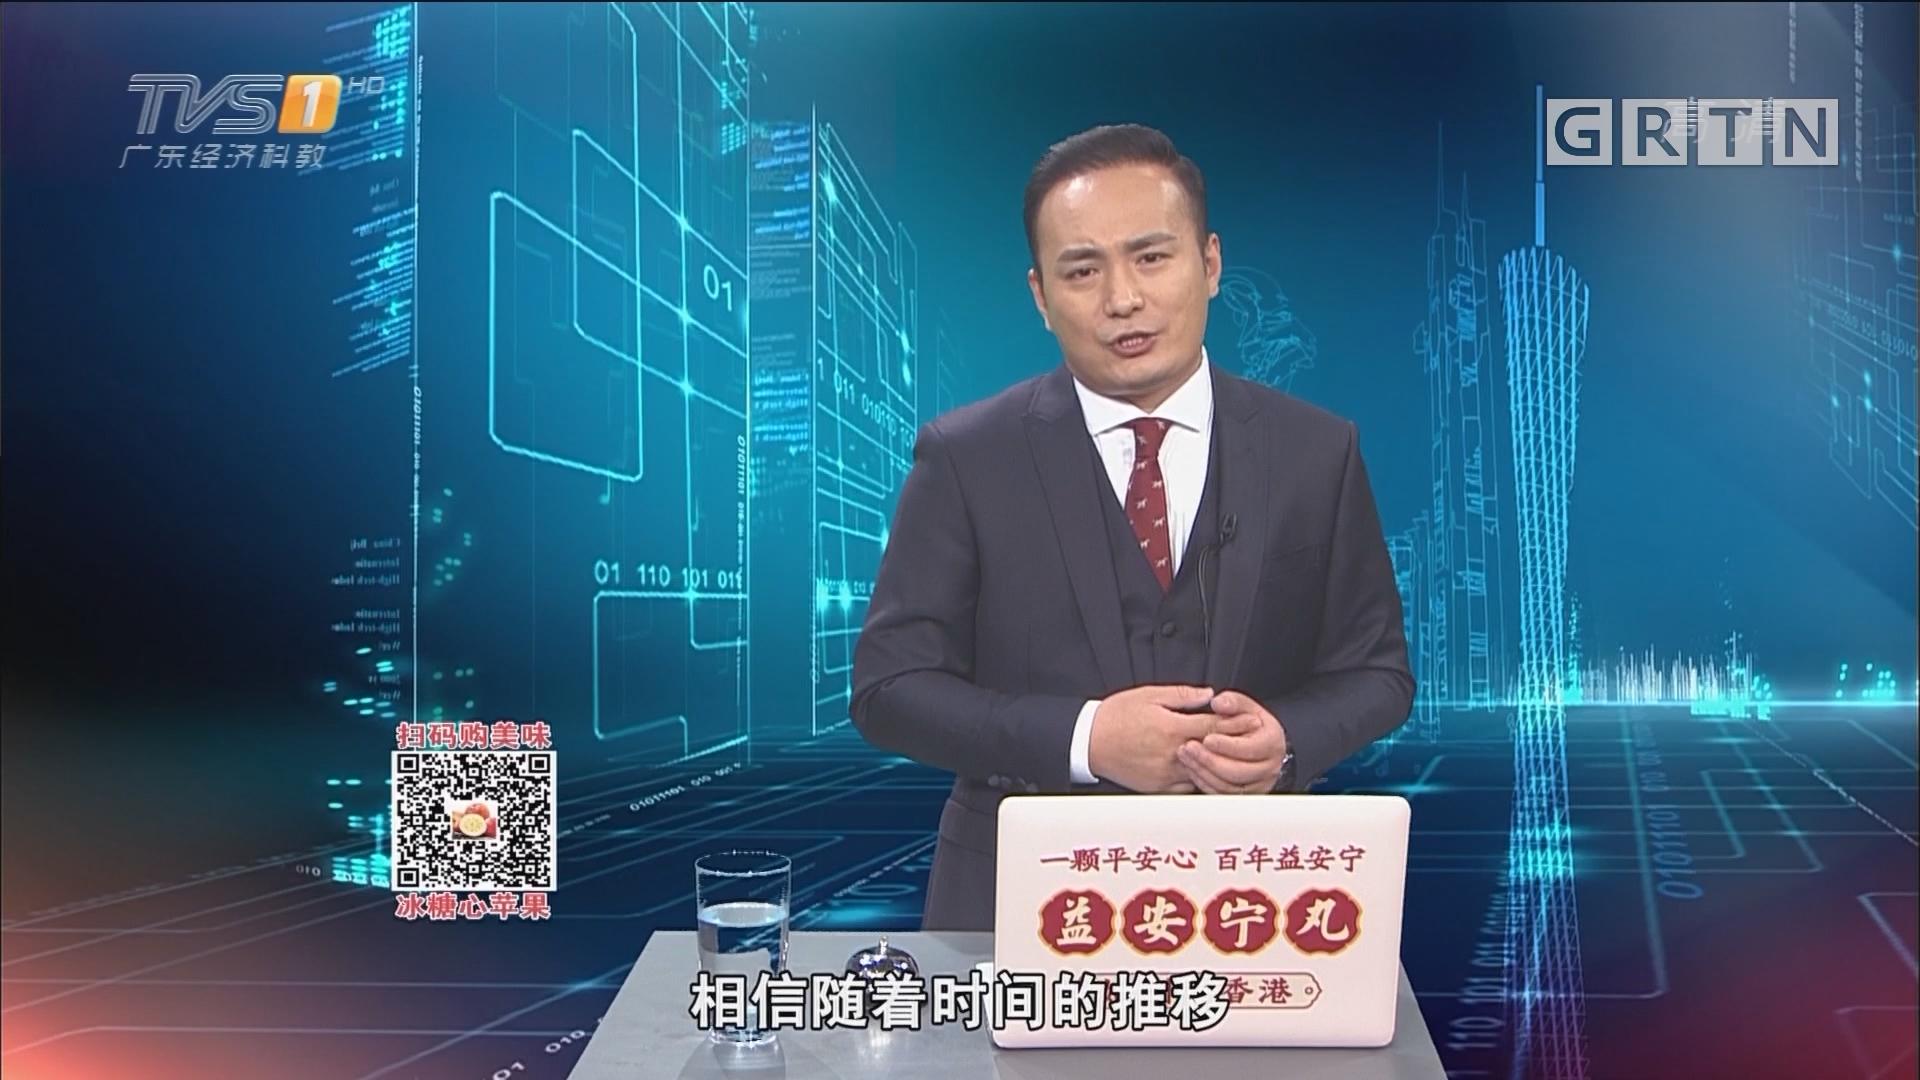 [HD][2018-12-13]马后炮:度假观念多元化 五一有几天假期已不重要